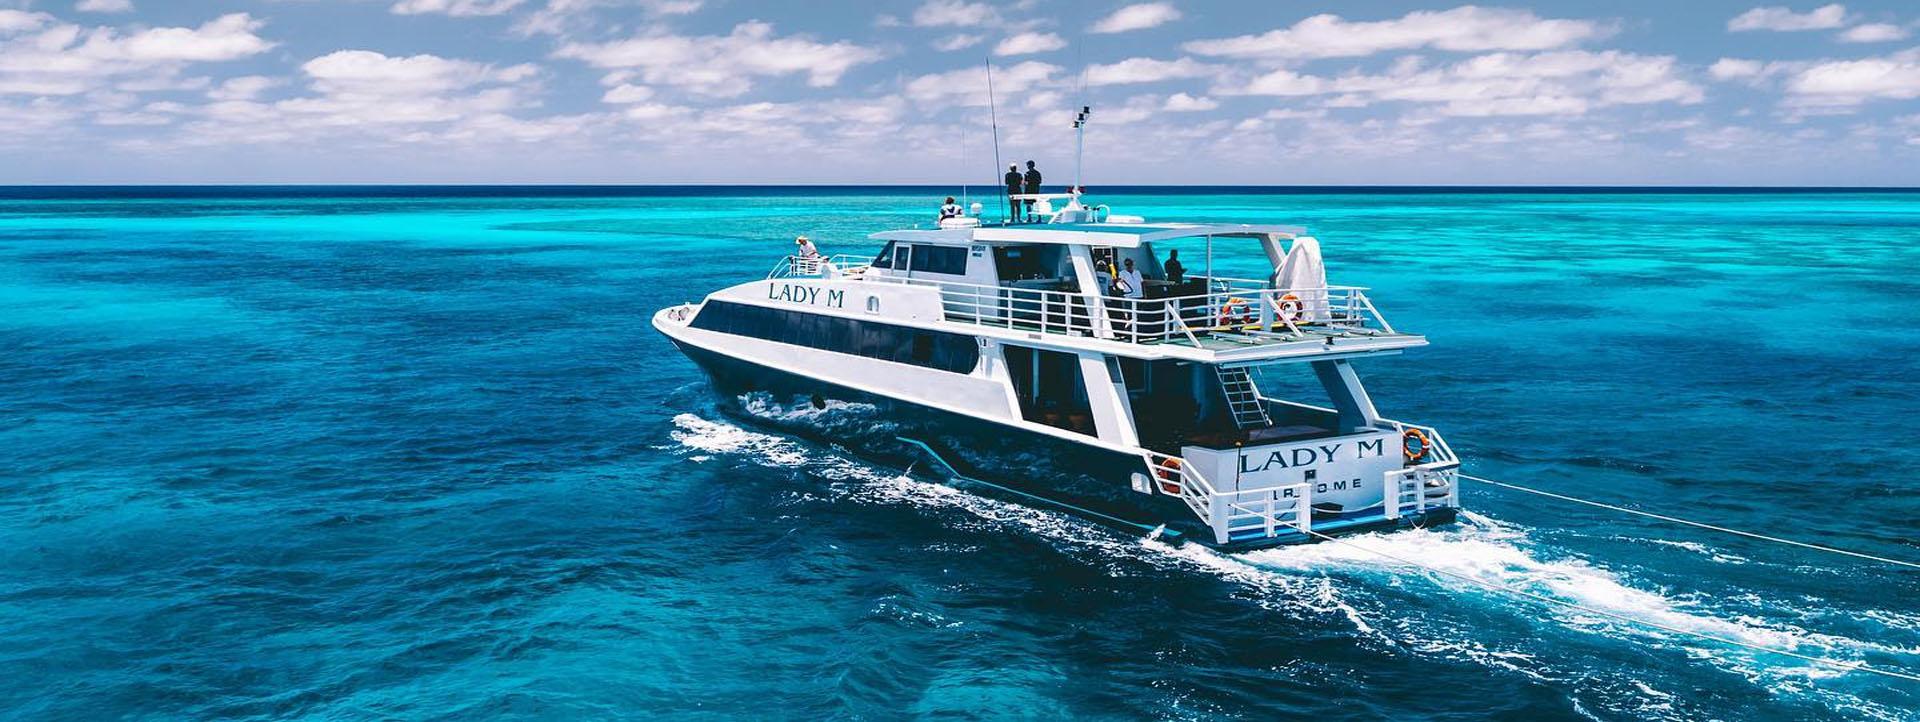 LADY M Rowley Shoals cruise blue lagoons